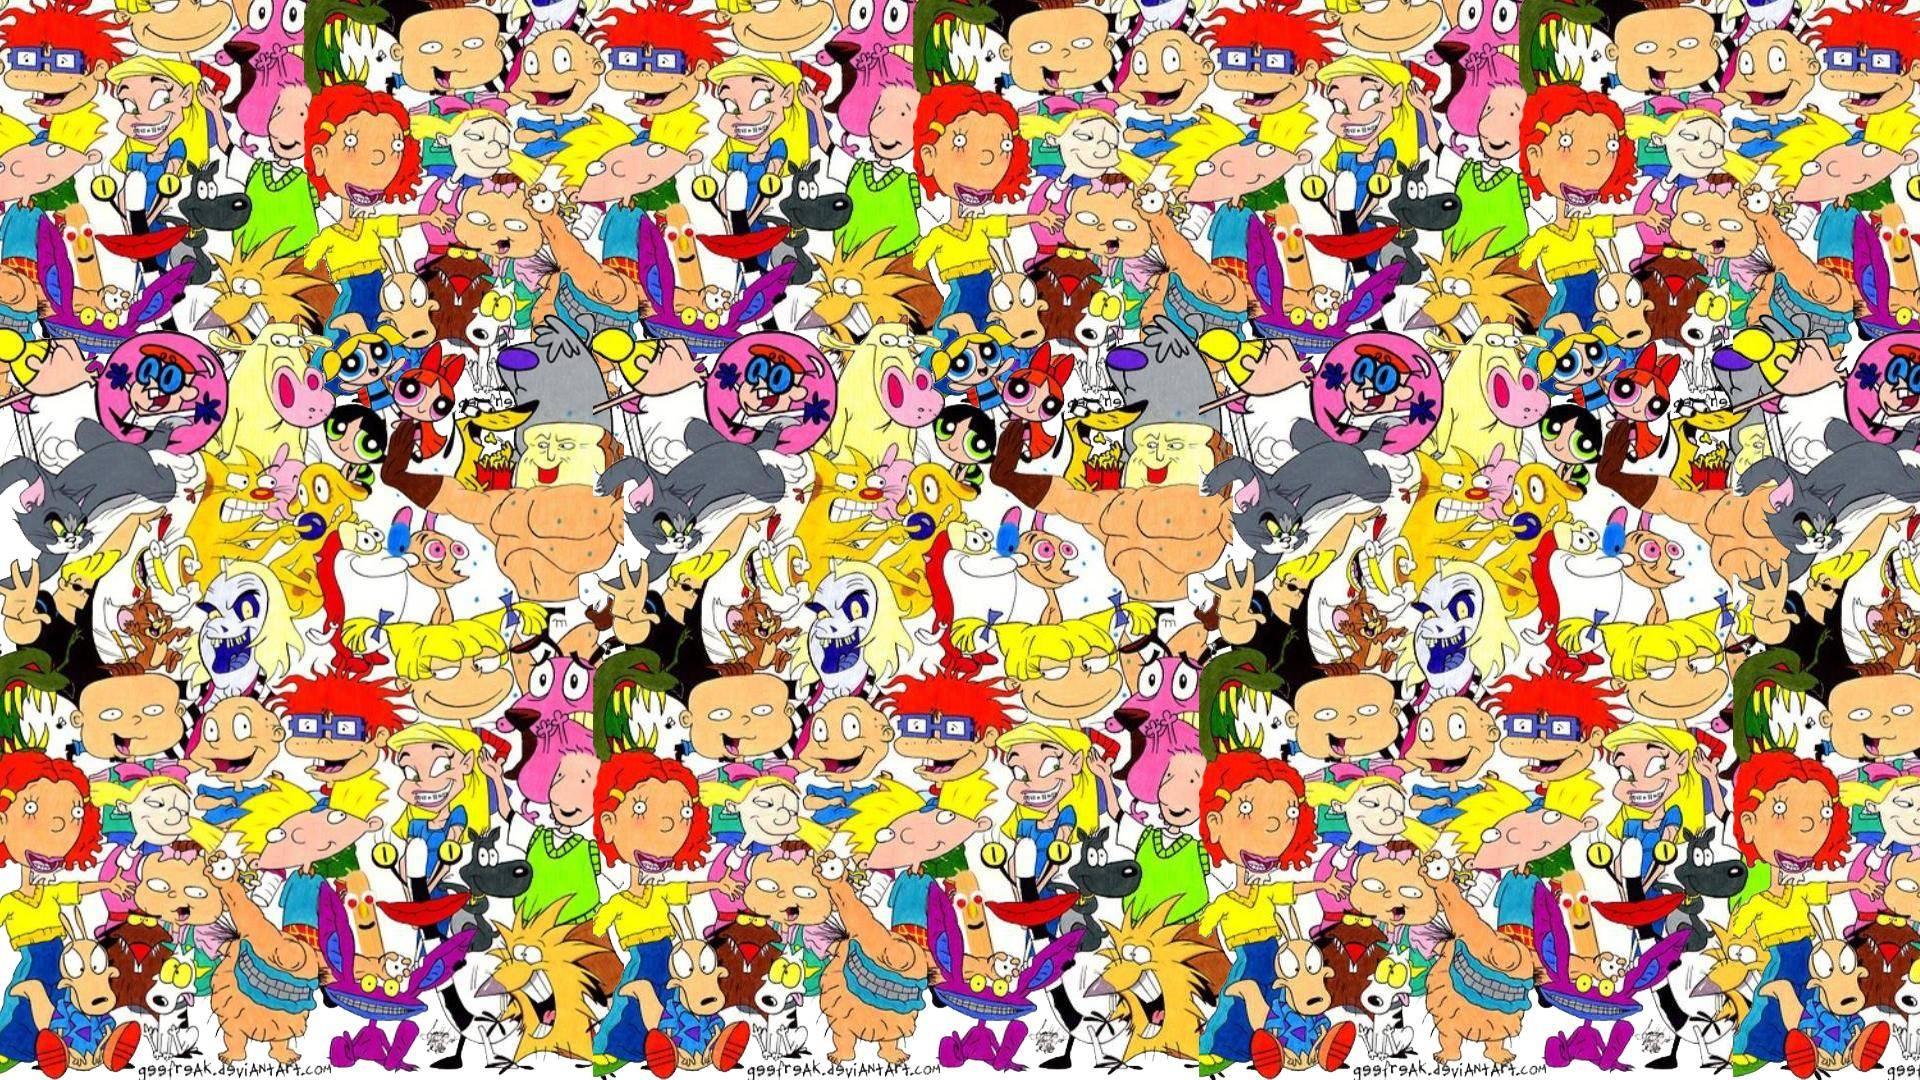 Nickelodeon Wallpaper 1920x1080